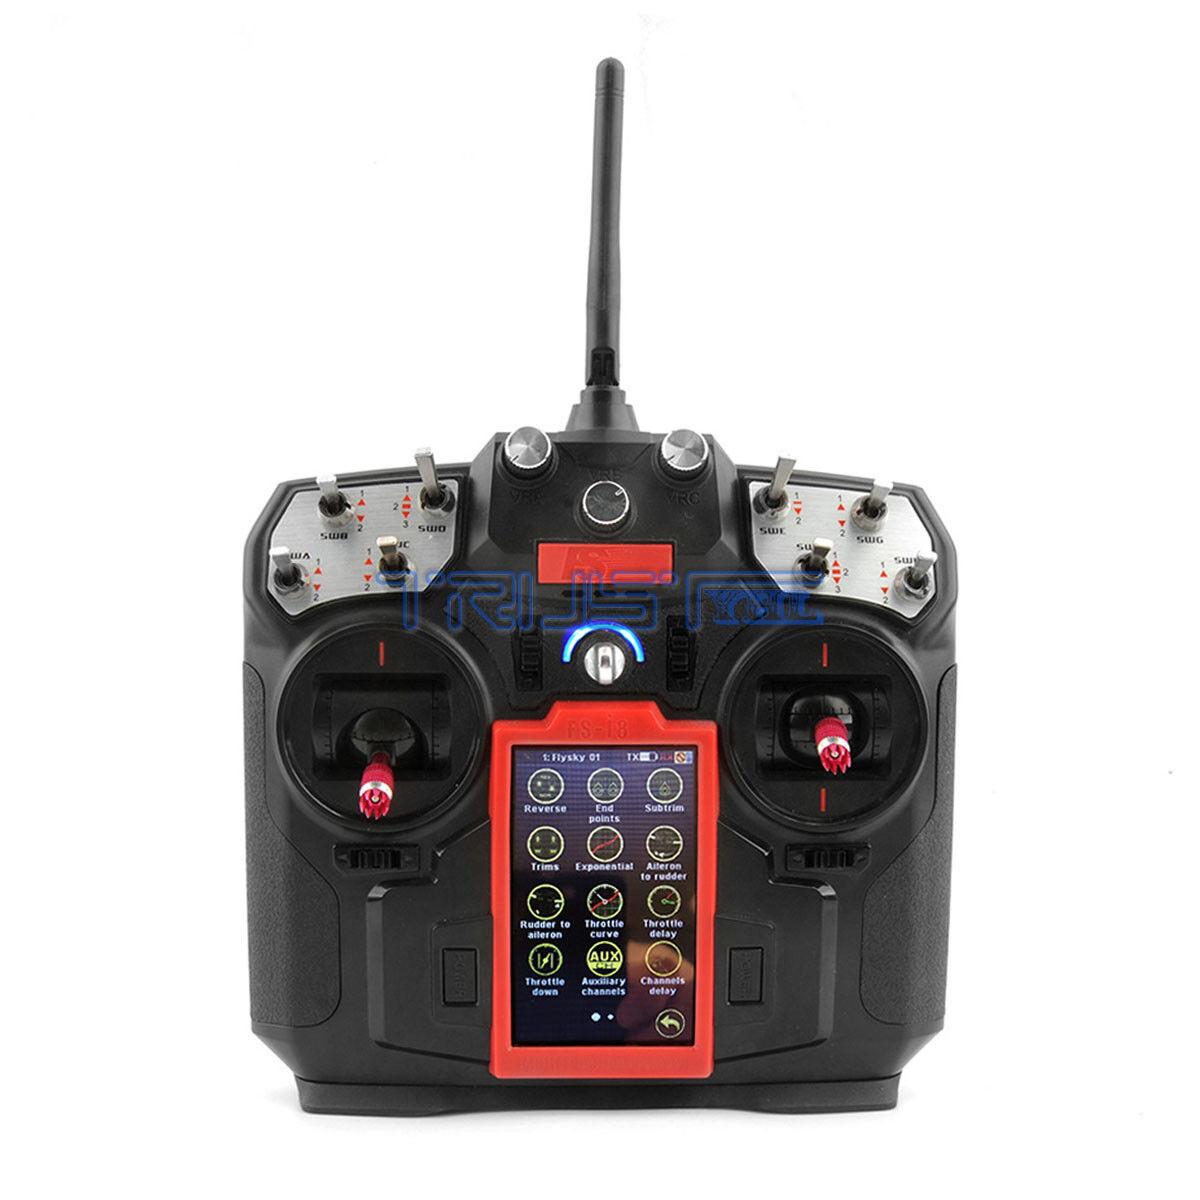 Flysky fs-i8 i8 8ch 2.4ghz AFHDS 2A LCD Transmitter with fs-ia6b Receiver.